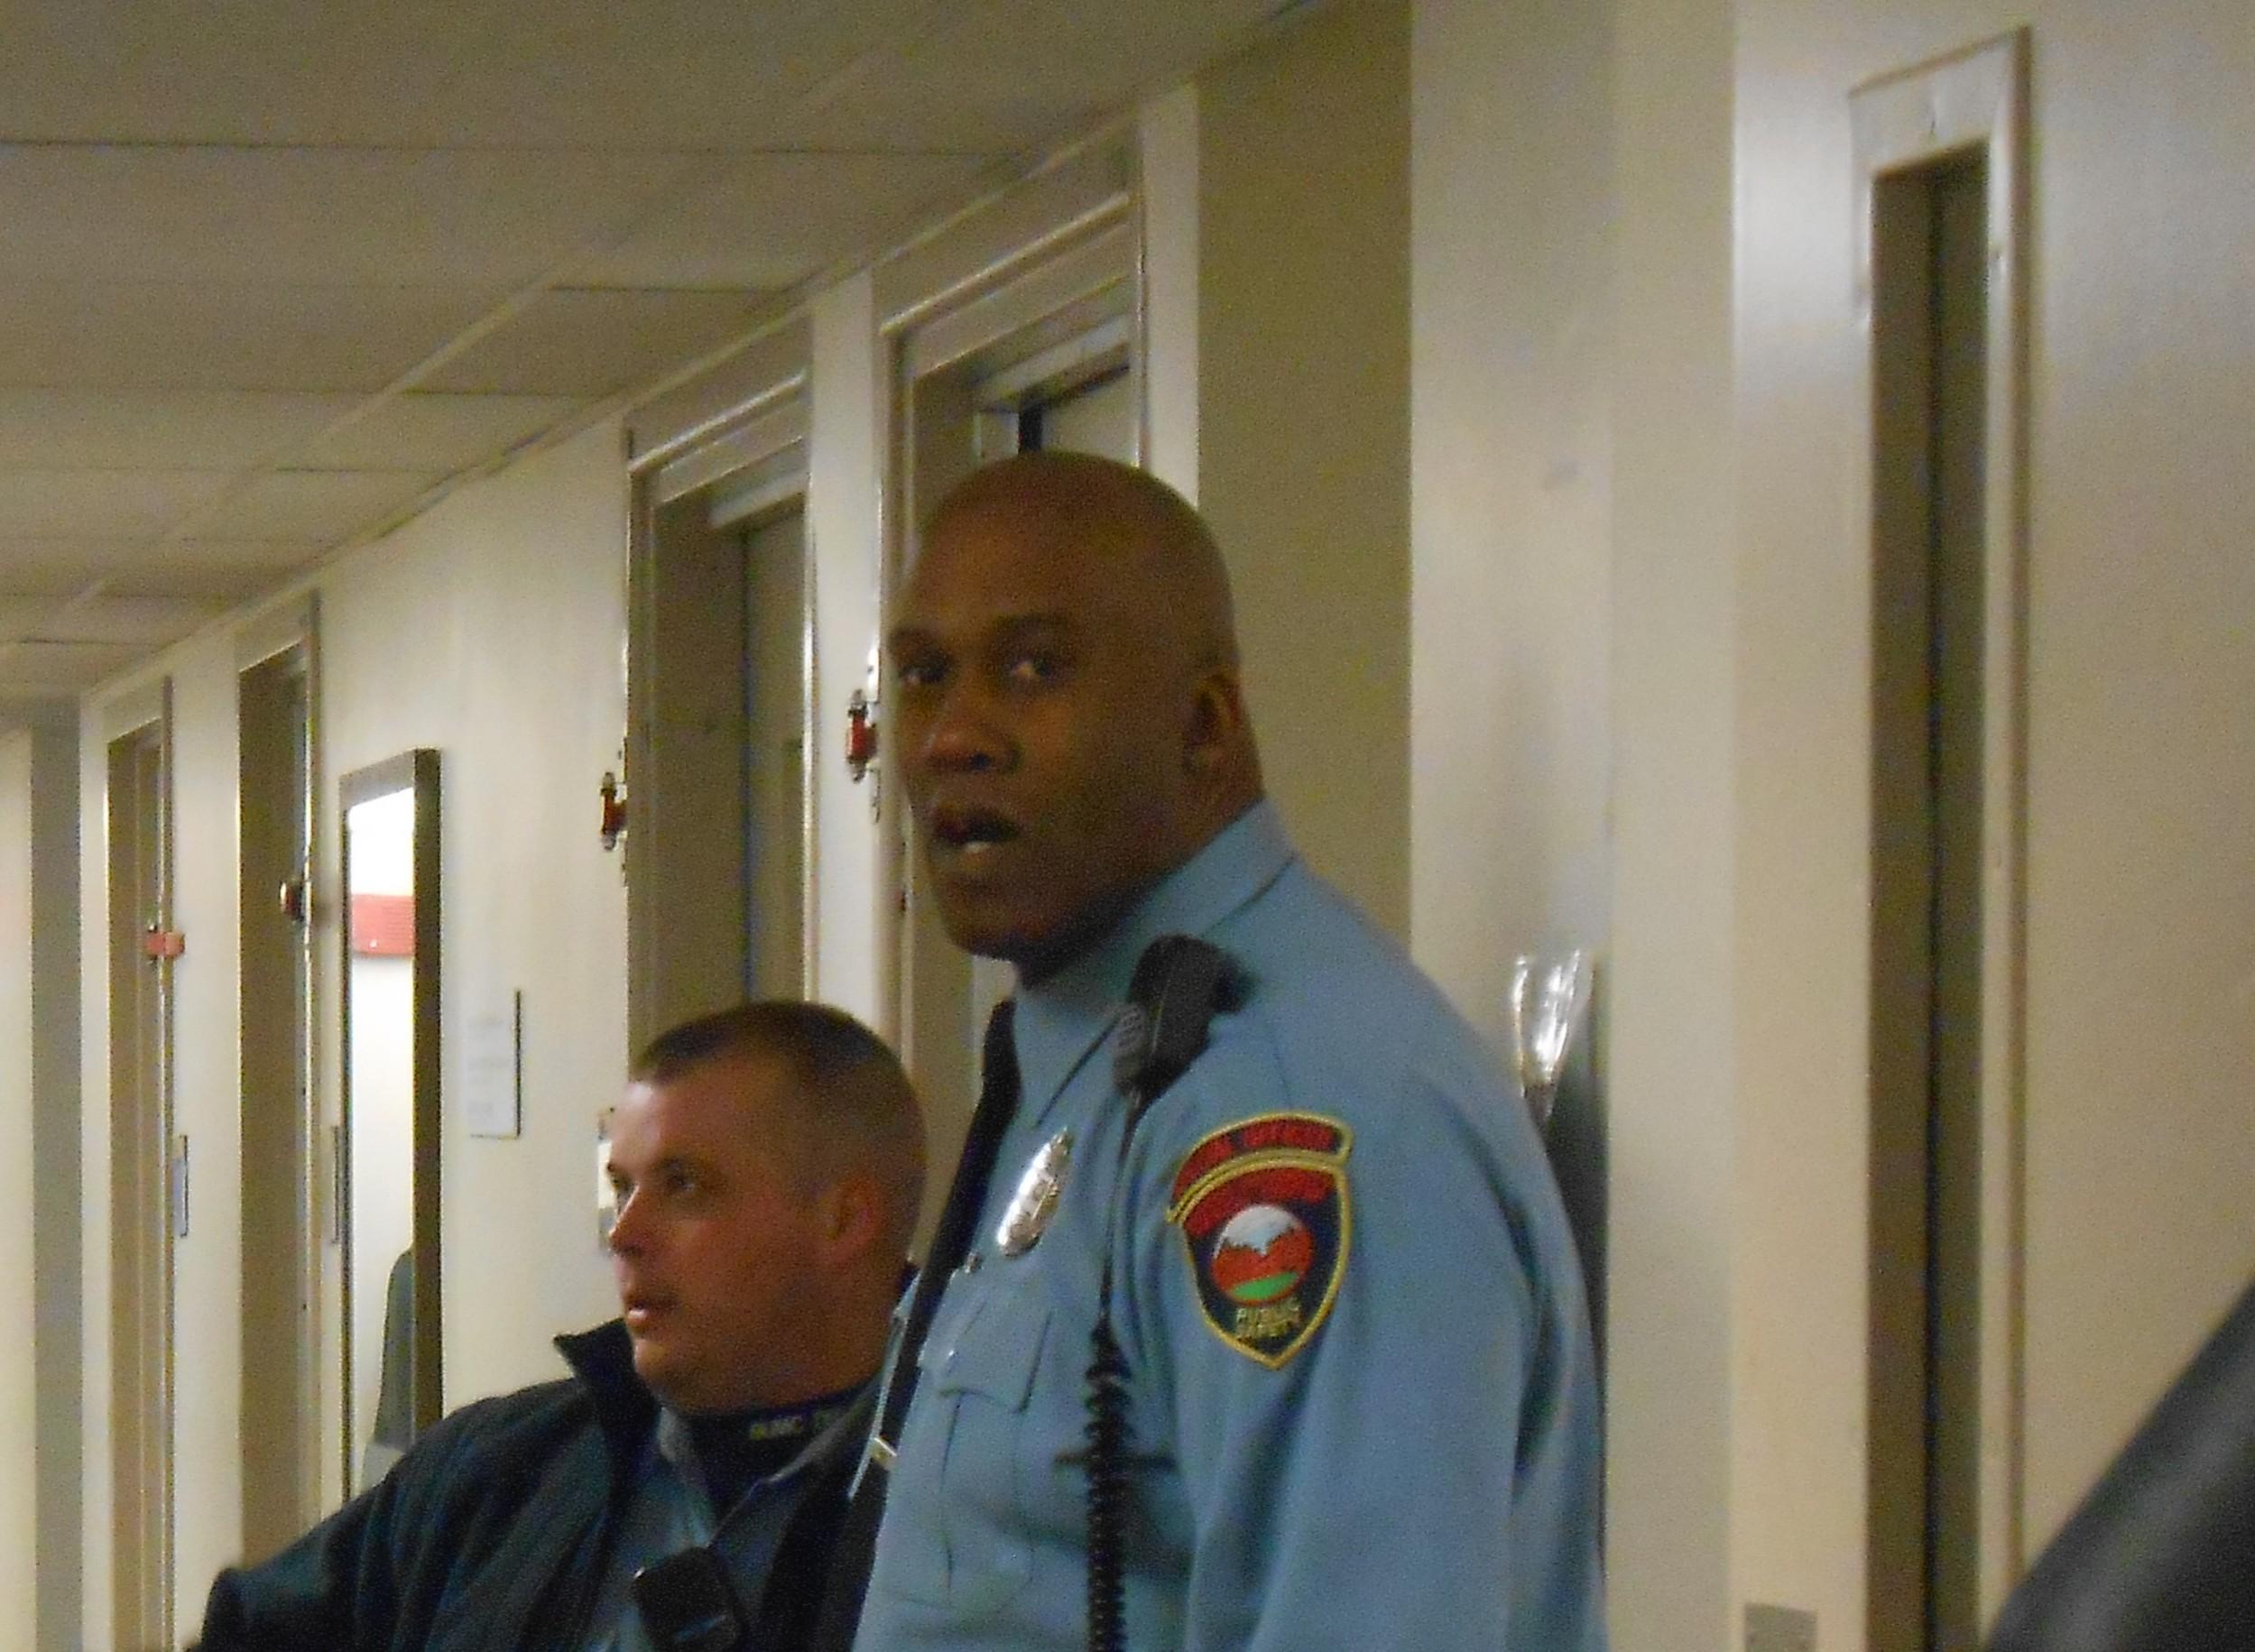 Boston medical center security